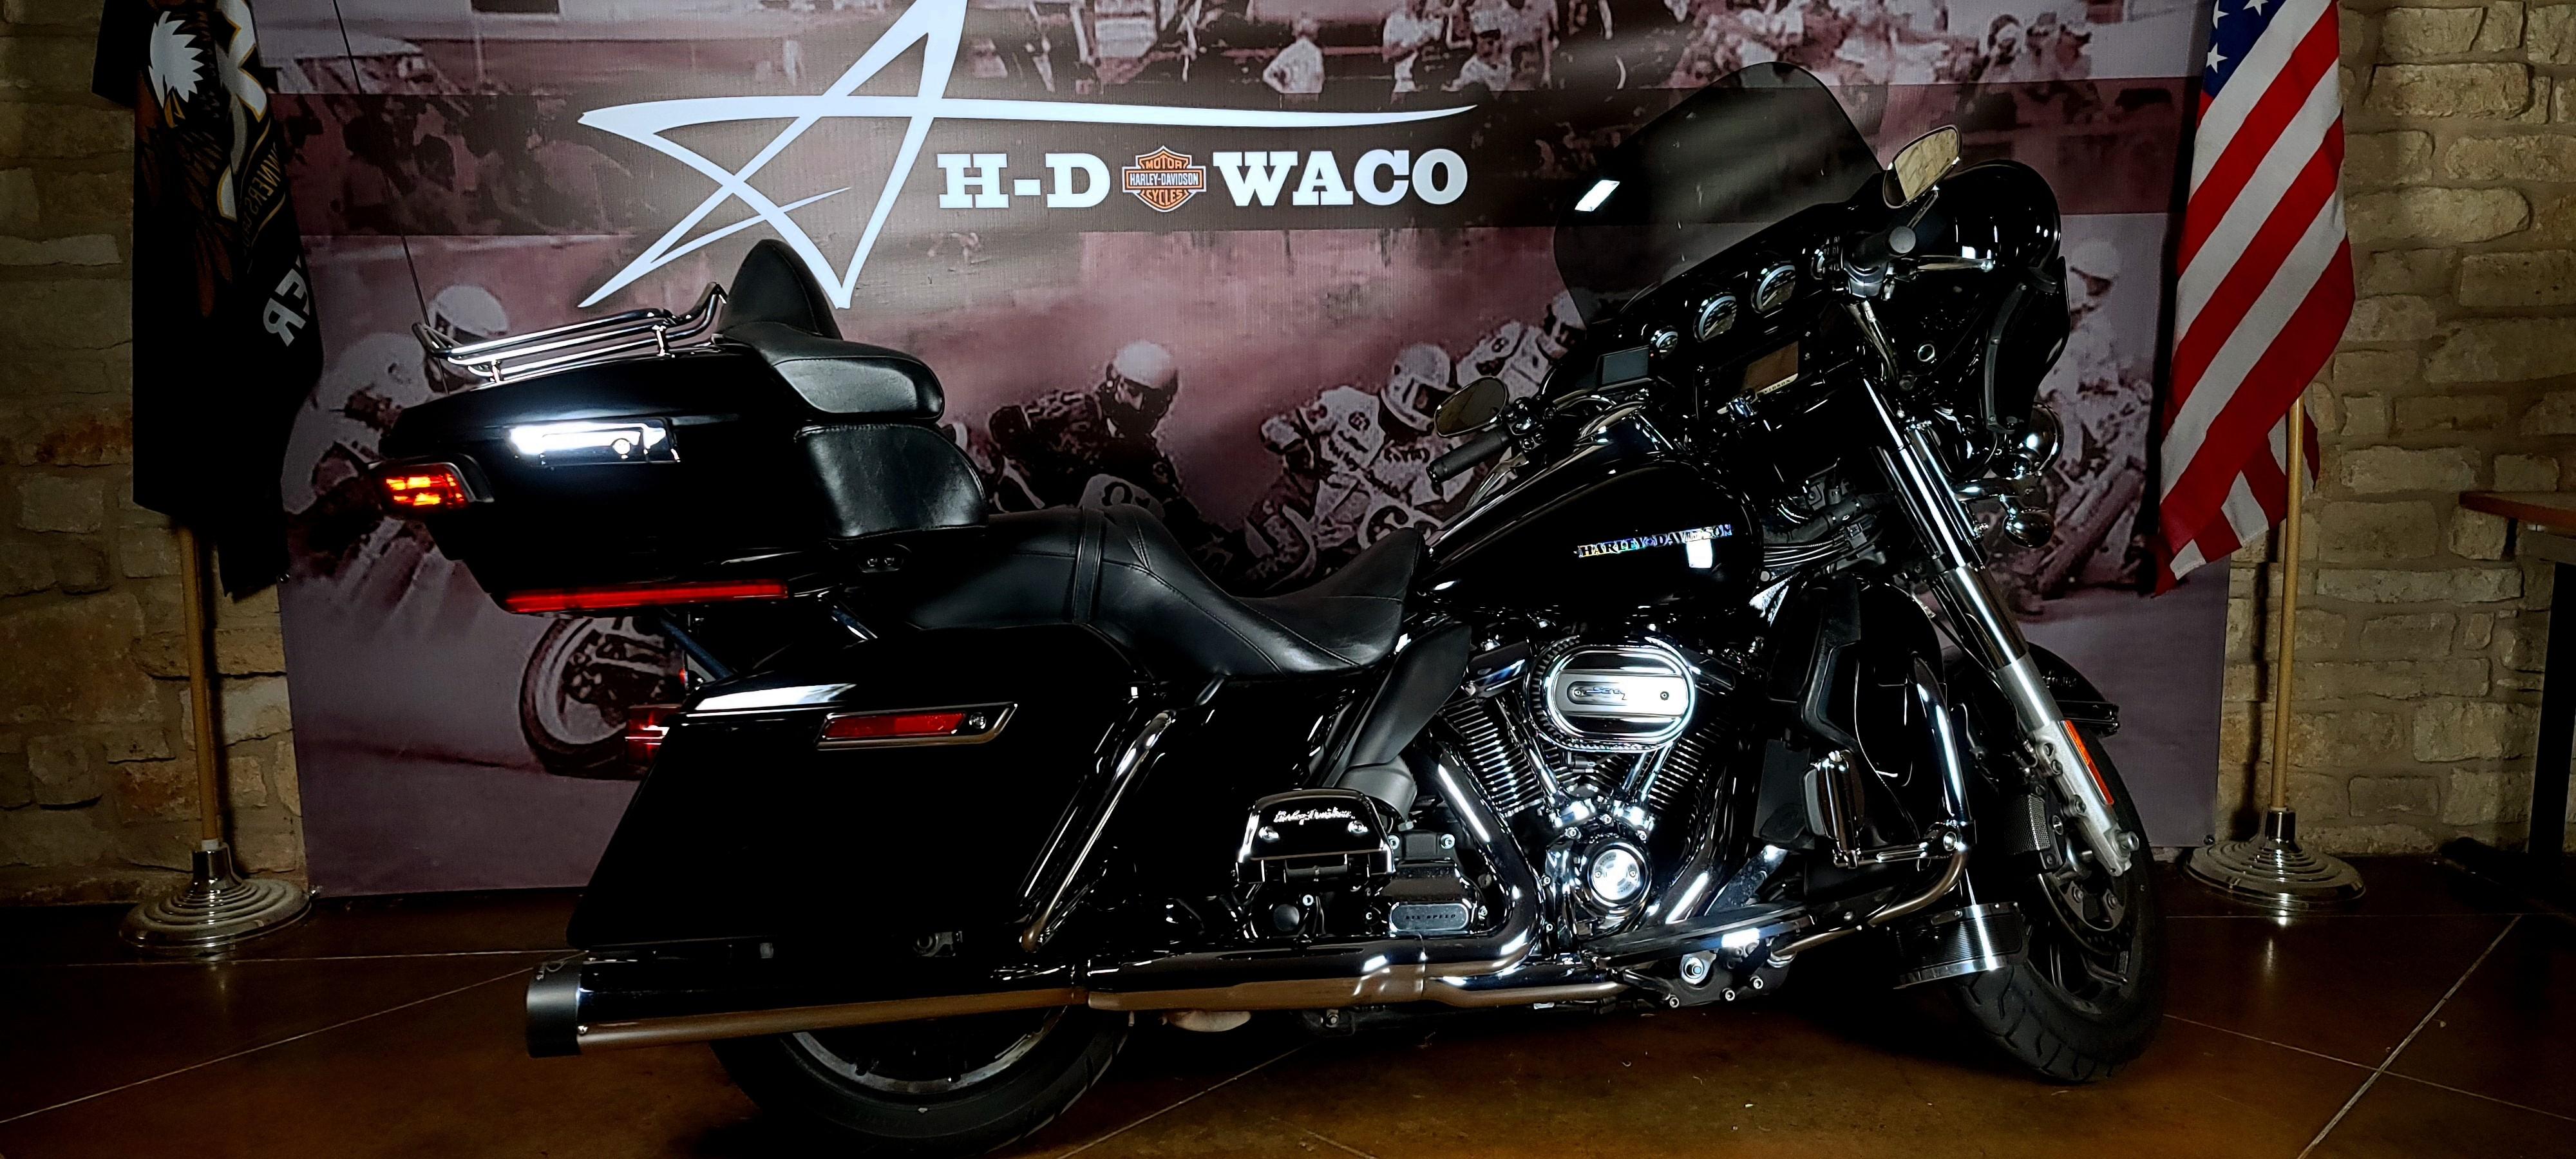 2018 Harley-Davidson Electra Glide Ultra Limited at Harley-Davidson of Waco